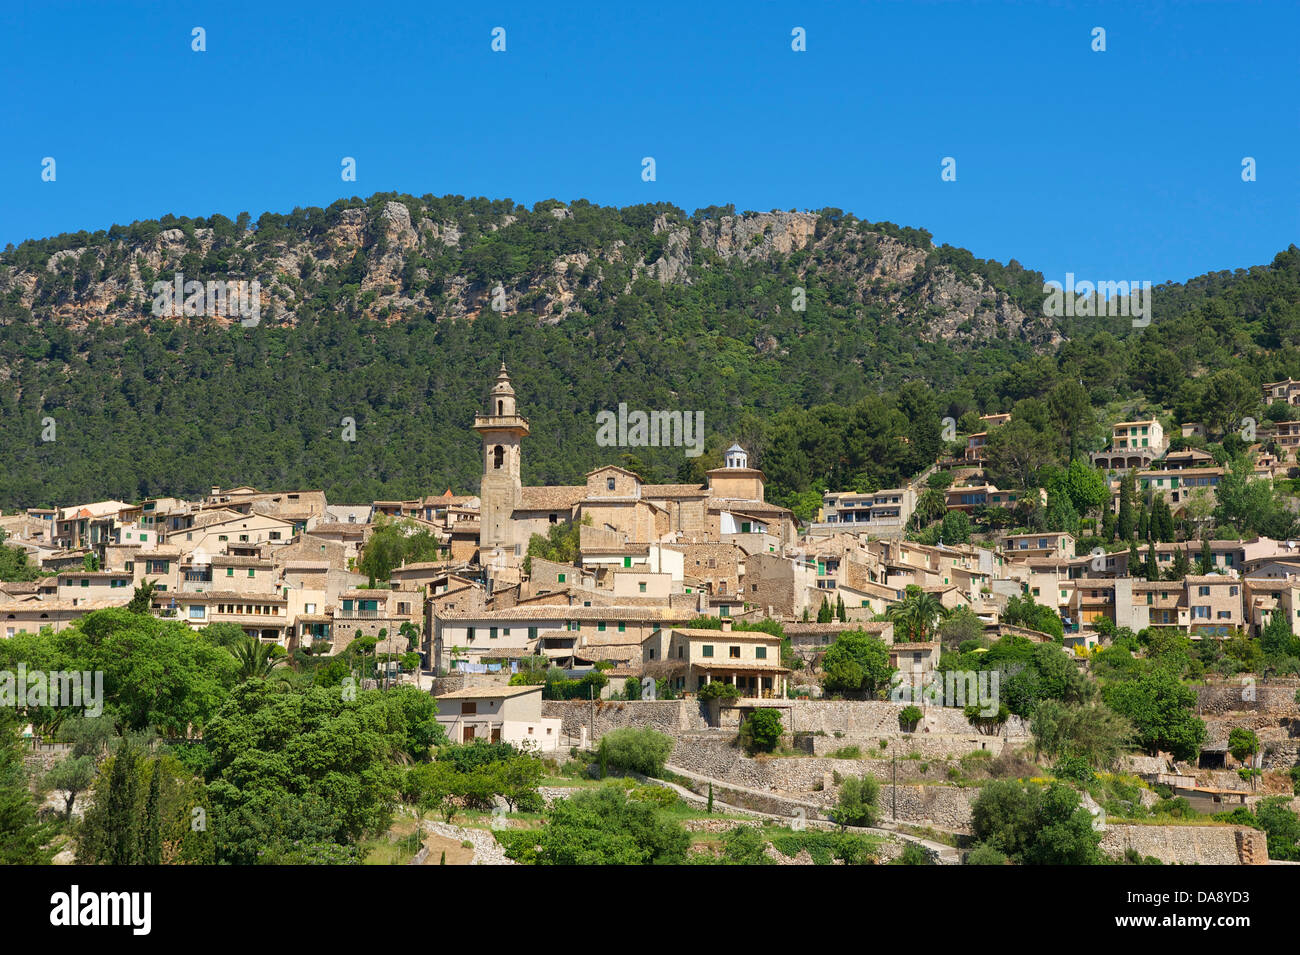 Balearic Islands, Majorca, Mallorca, Spain, Europe, outside, Valldemossa, Valldemosa, town view, day, nobody, Stock Photo